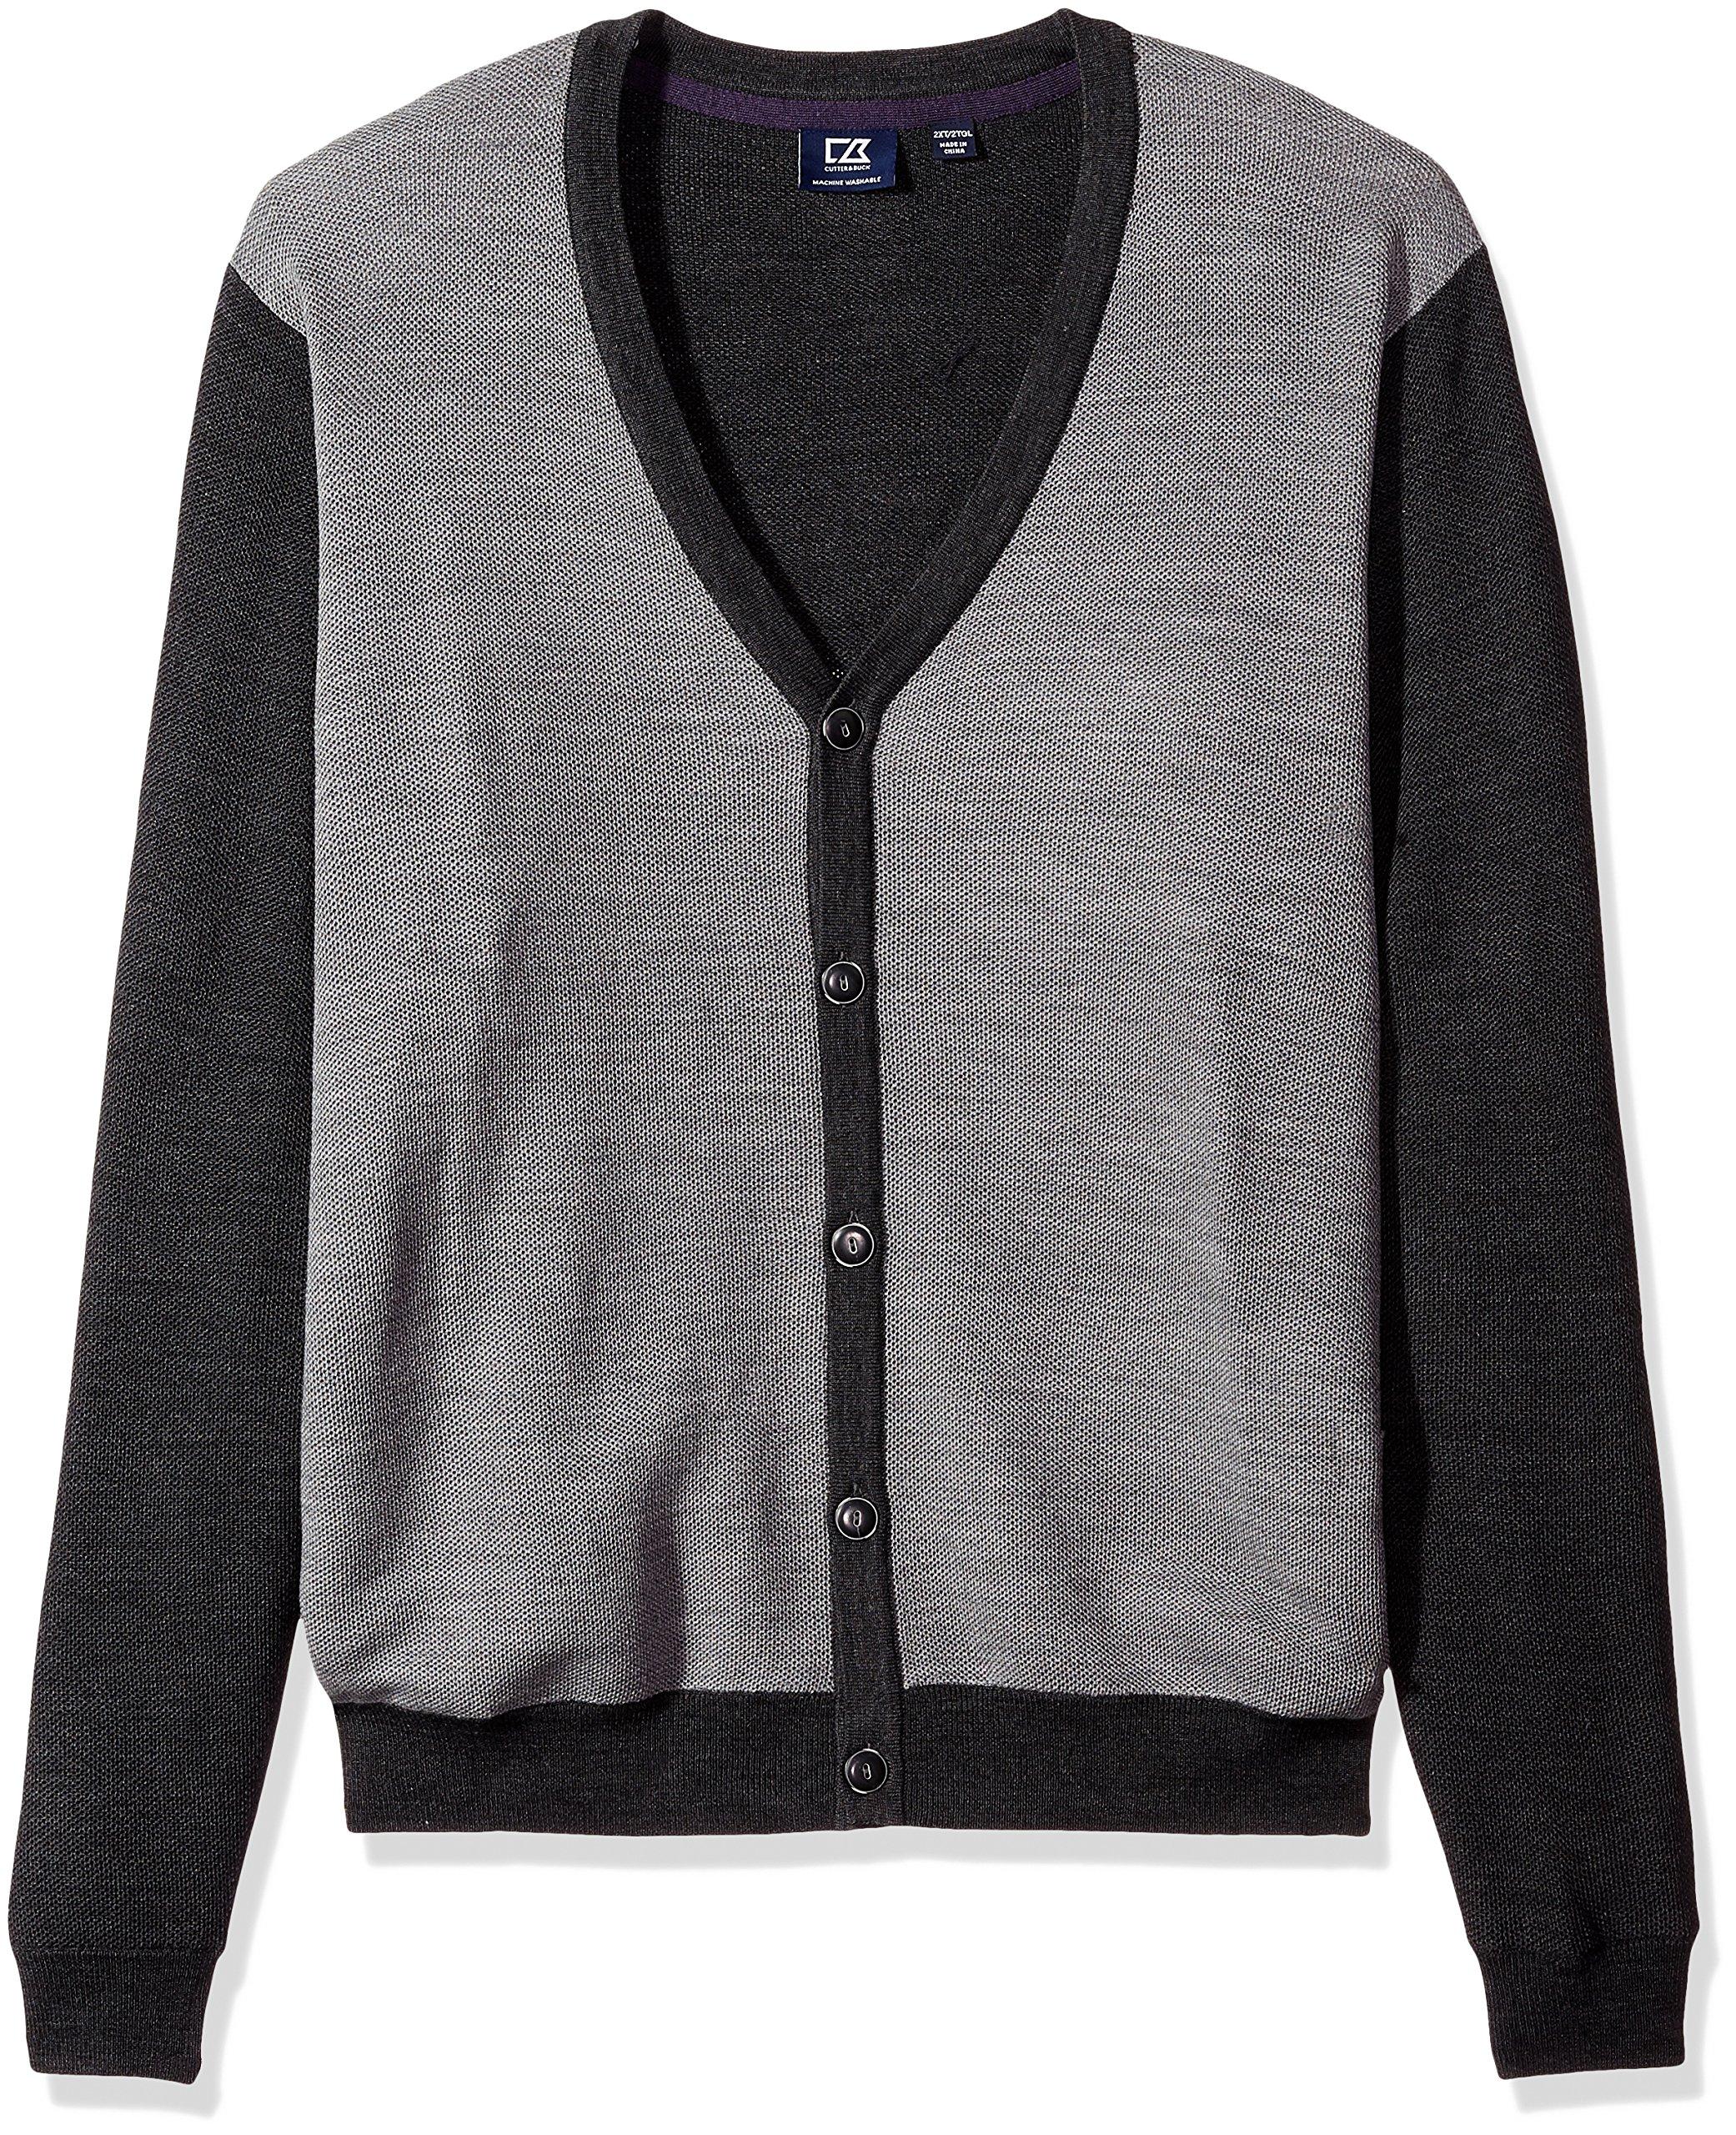 Cutter & Buck Men's Big-Tall Cornish Cardigan Sweater, Charcoal Heather, 5X/Big